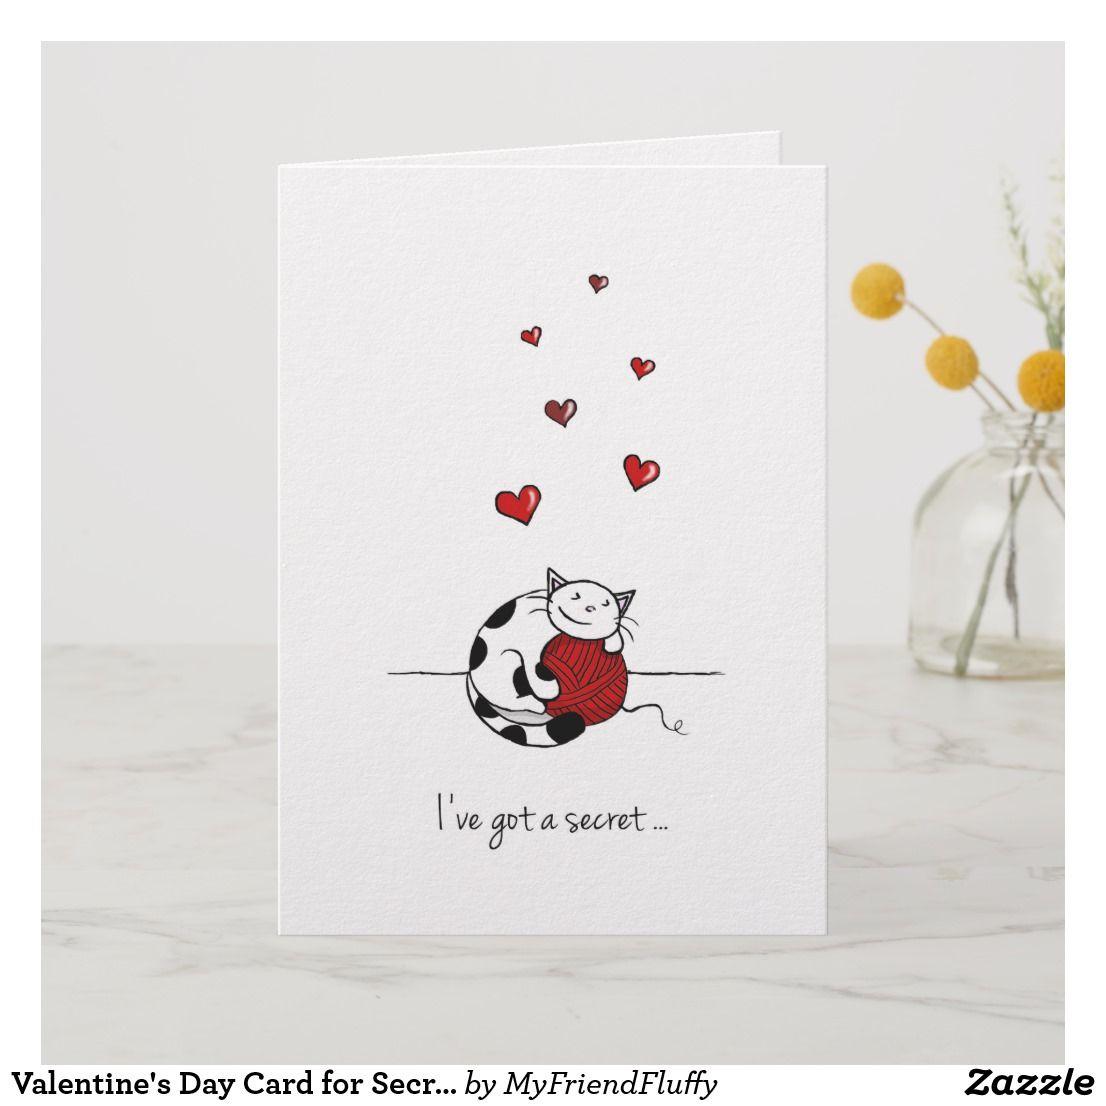 Valentine S Day Card For Secret Love Cute Cat Zazzle Com In 2021 Valentine Day Cards Valentines Cards Valentines Day Cards Diy